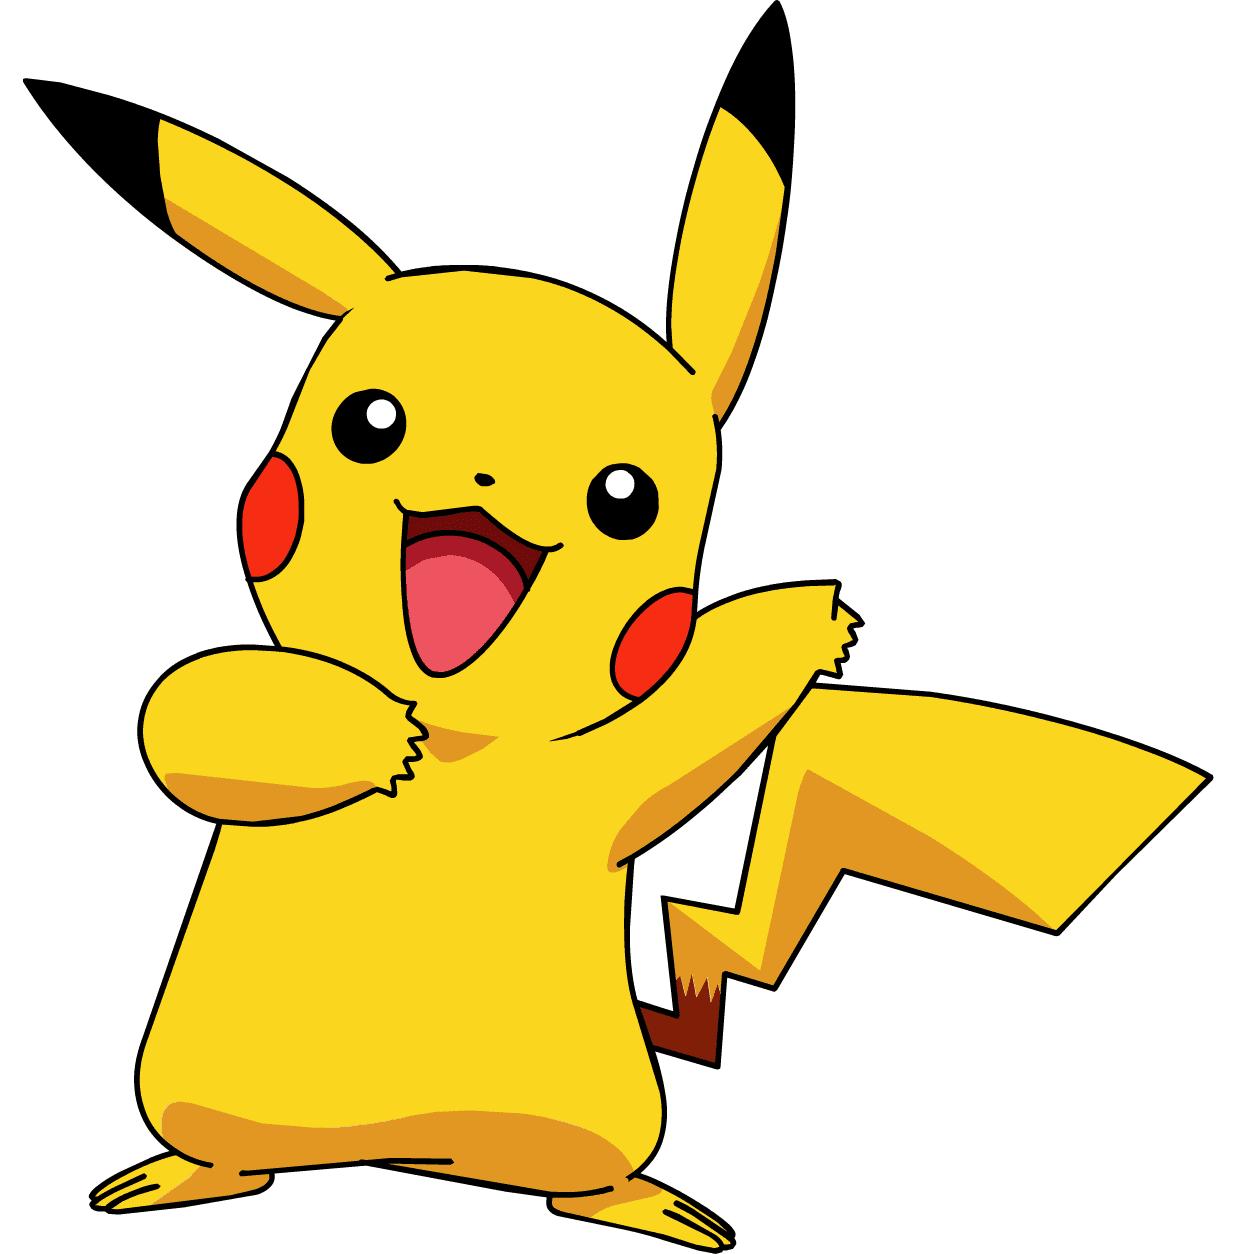 Pokemon Yang Susah Didapatkan 1